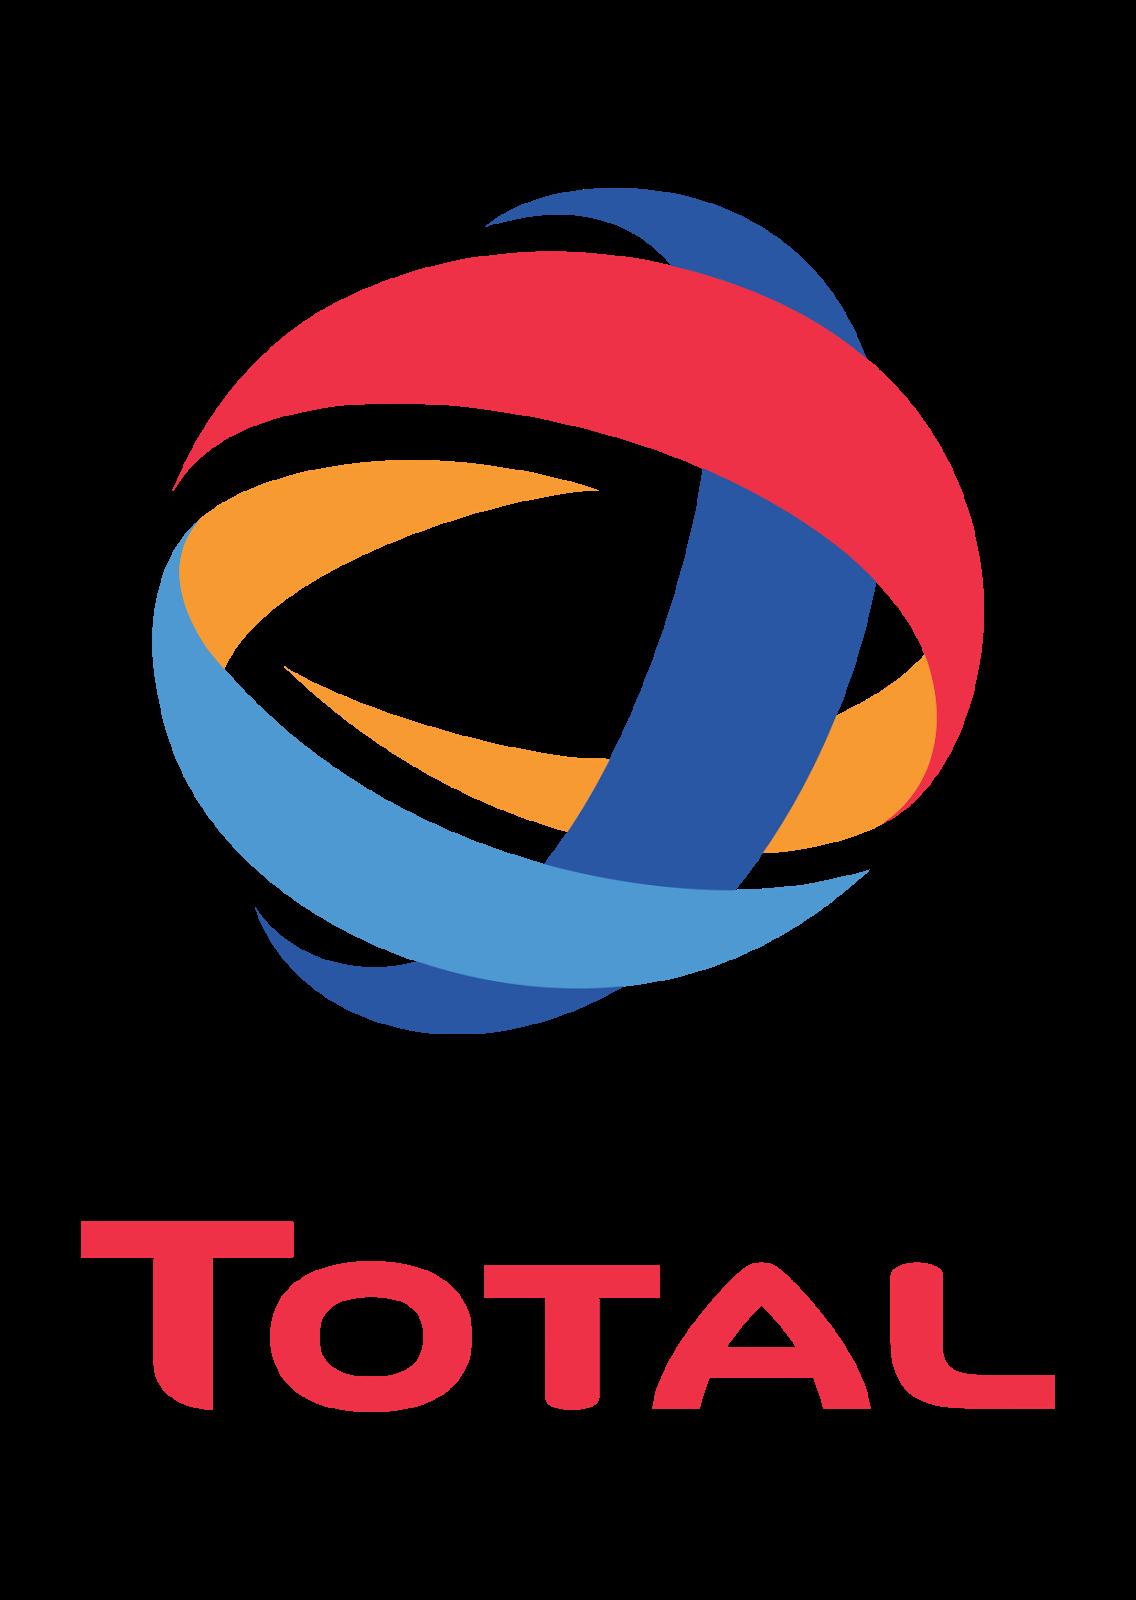 Total Logo Vector - Total Logo PNG